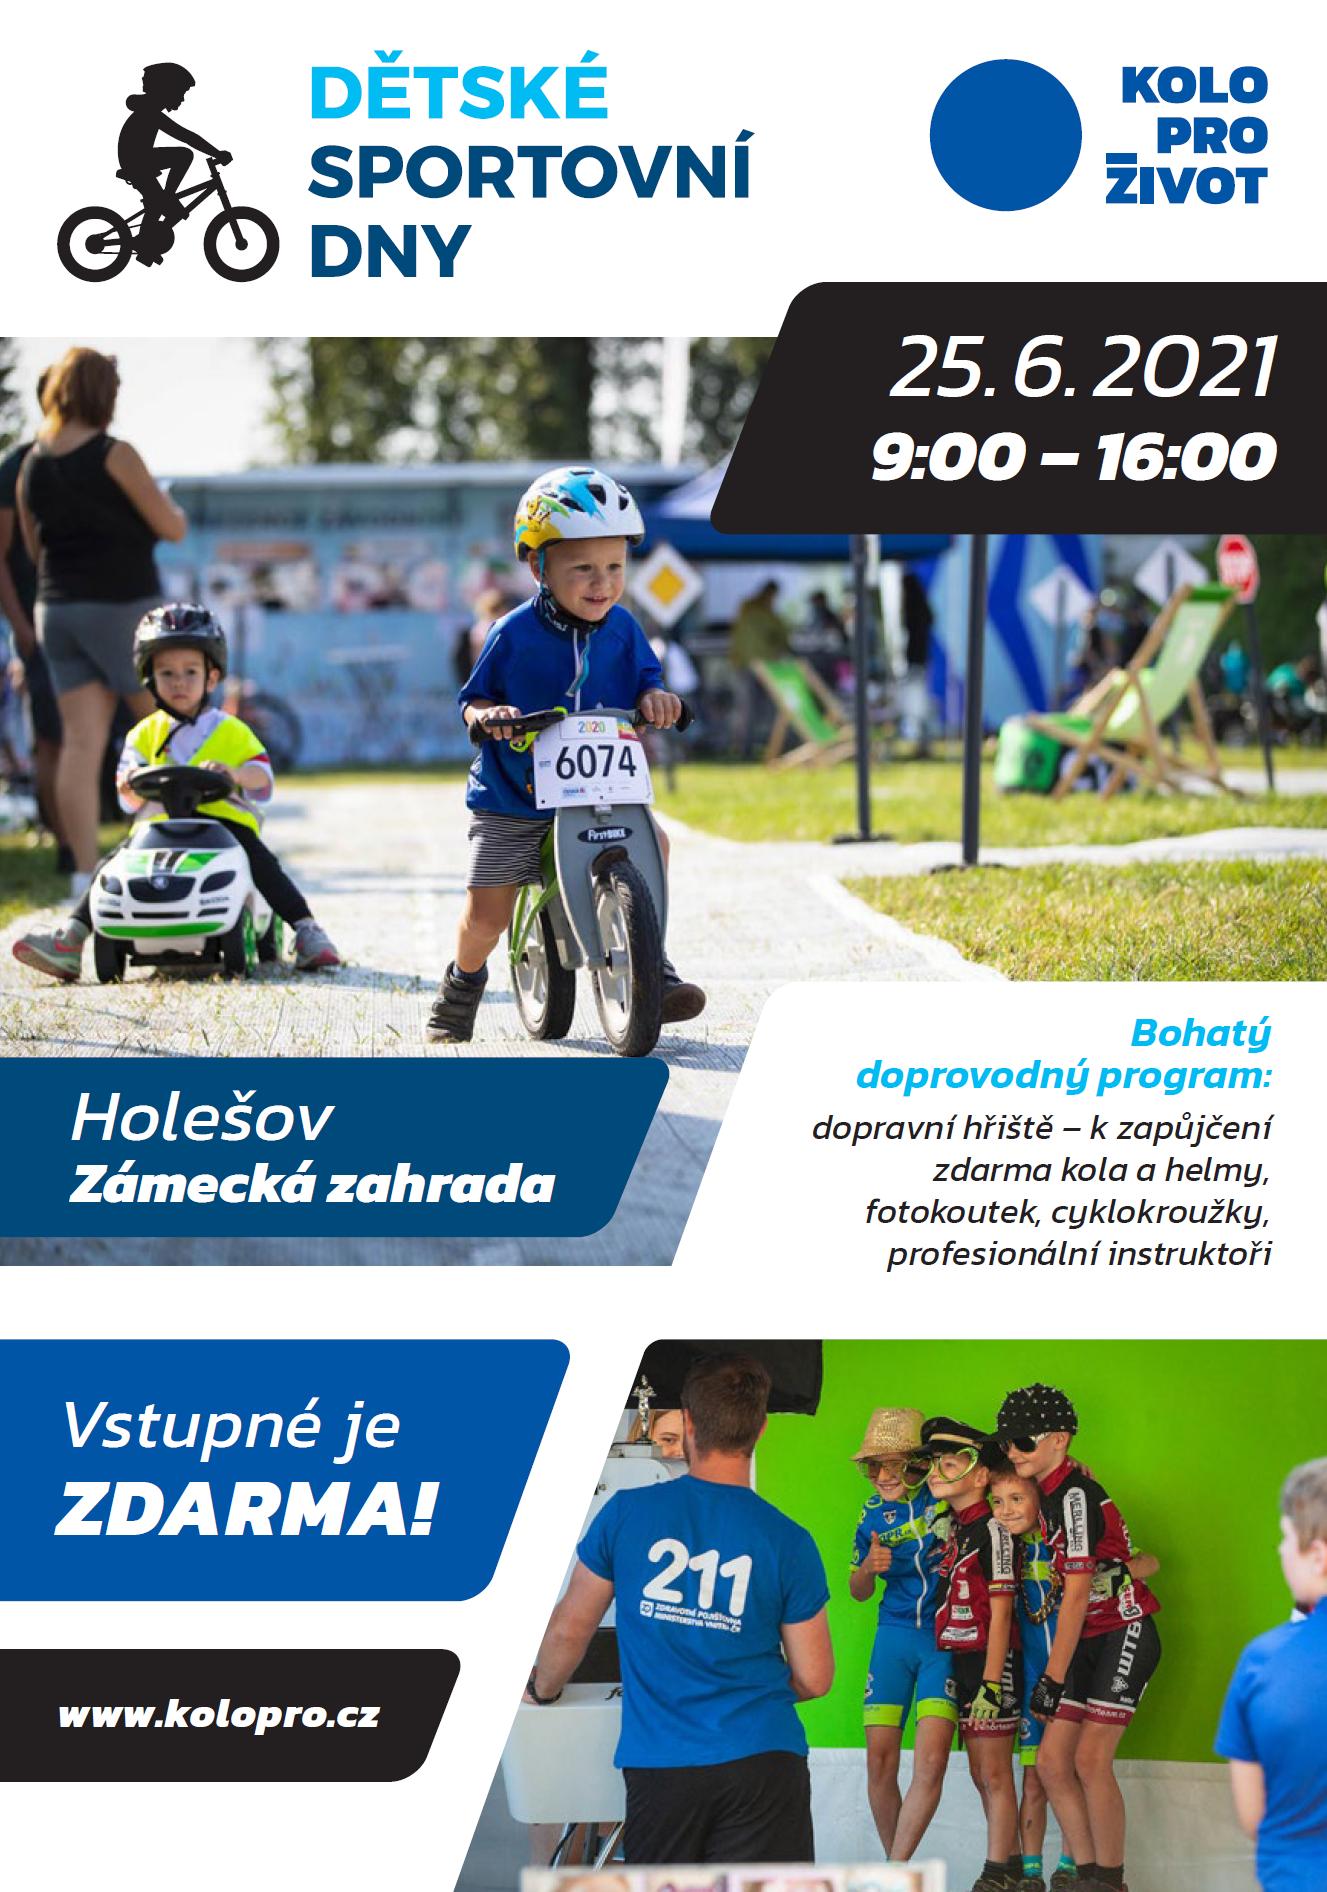 detske-sportovni-dny.png